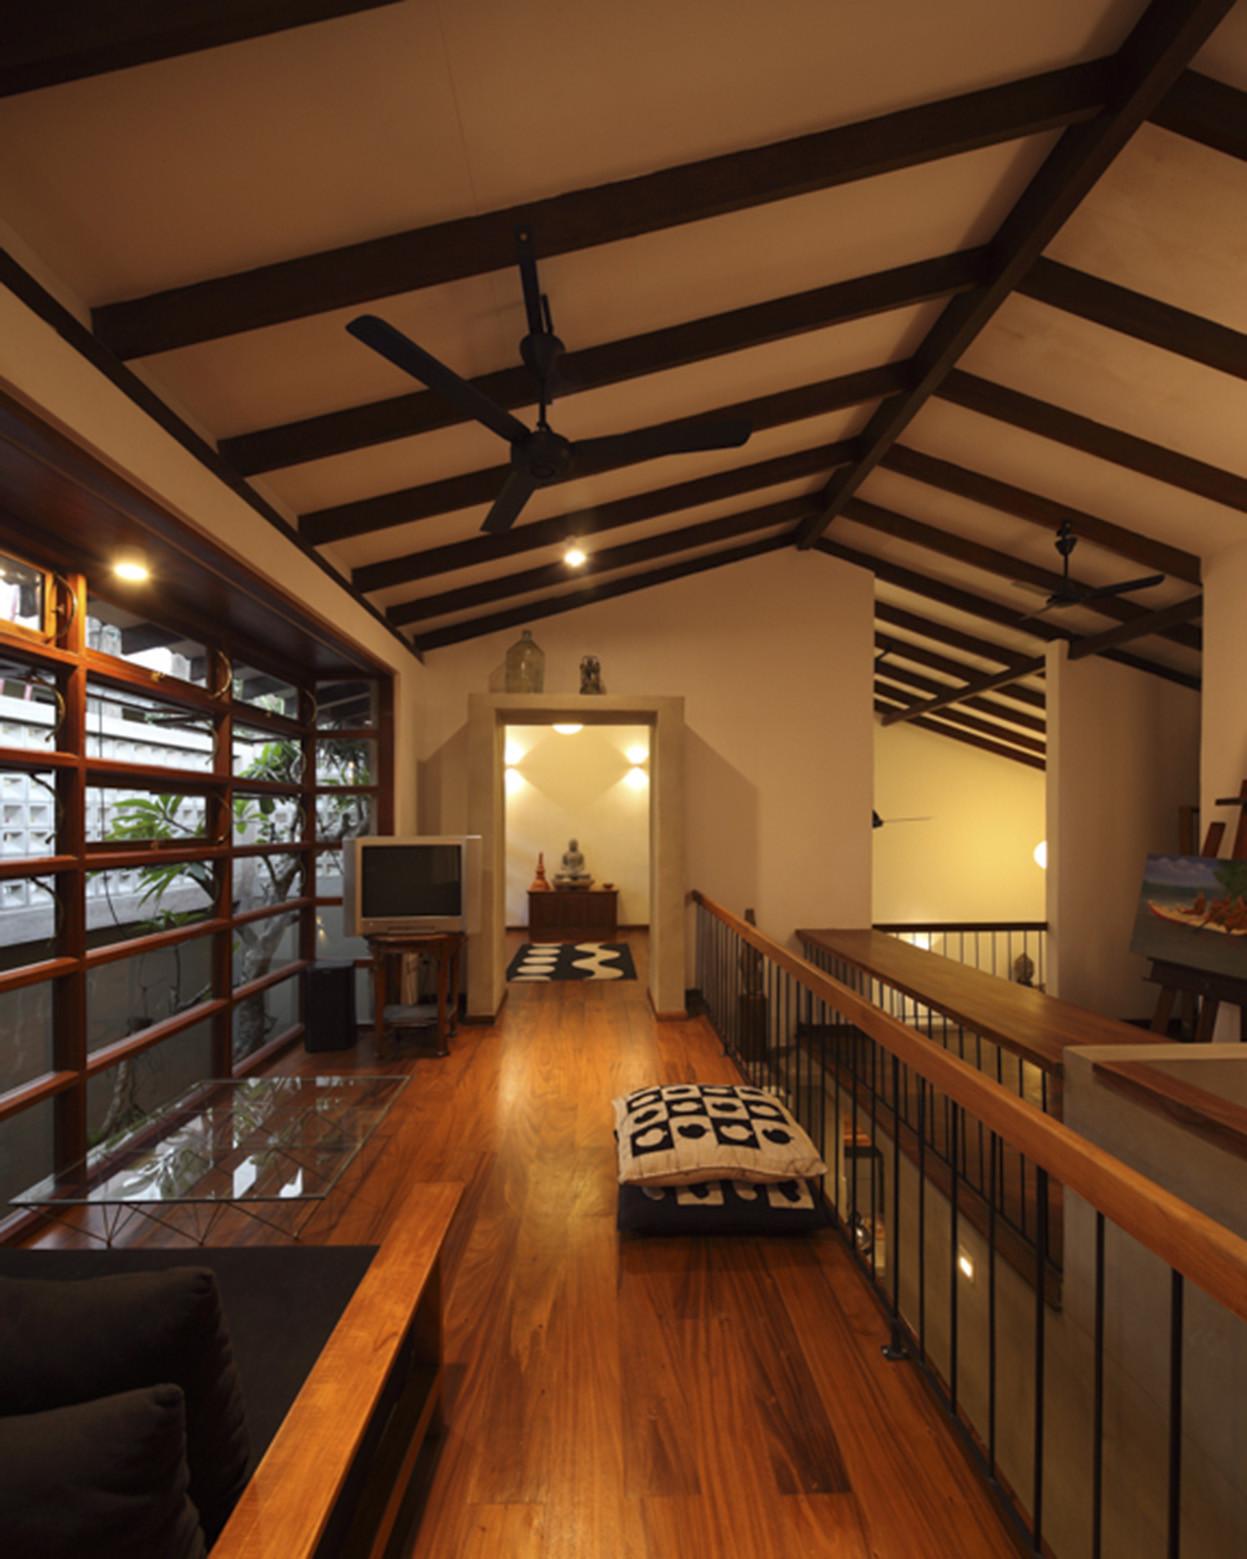 IMG_2509_10_11-12.jpg?1423449576 Sri Lanka House Designs Master E A on